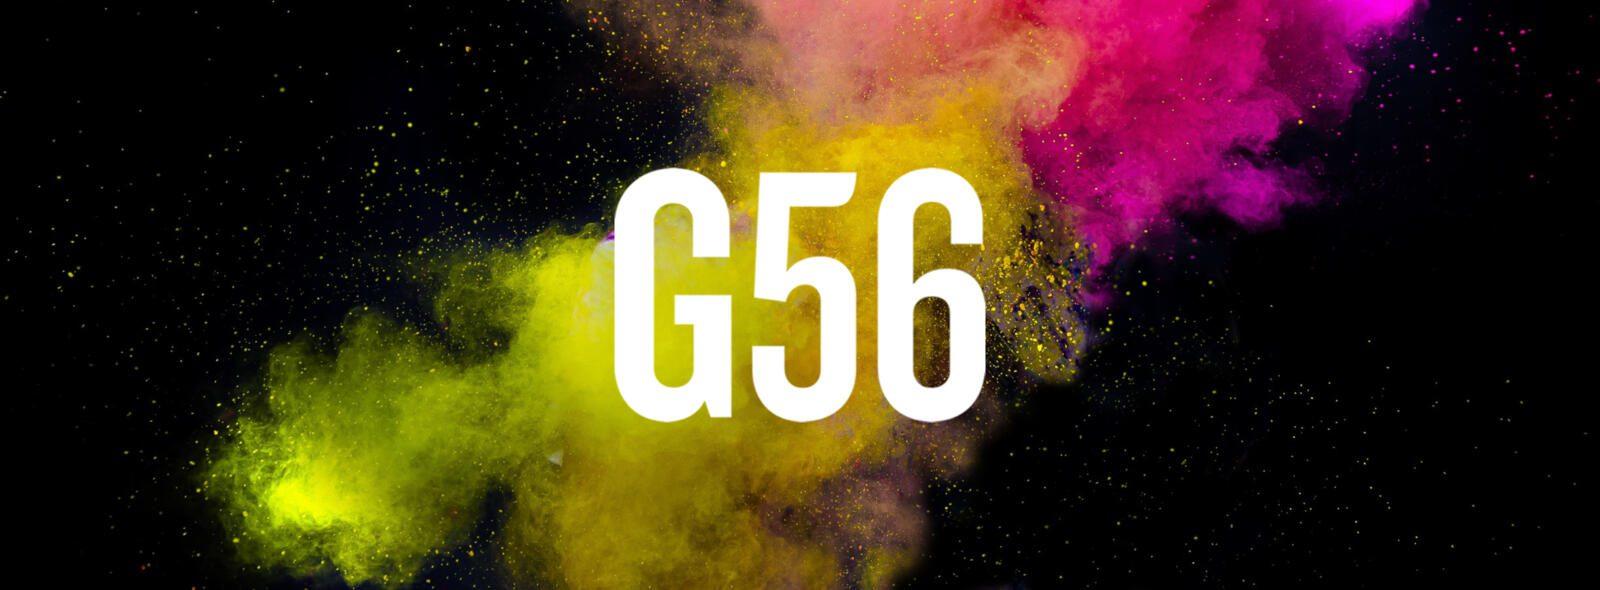 G56 – Lindale